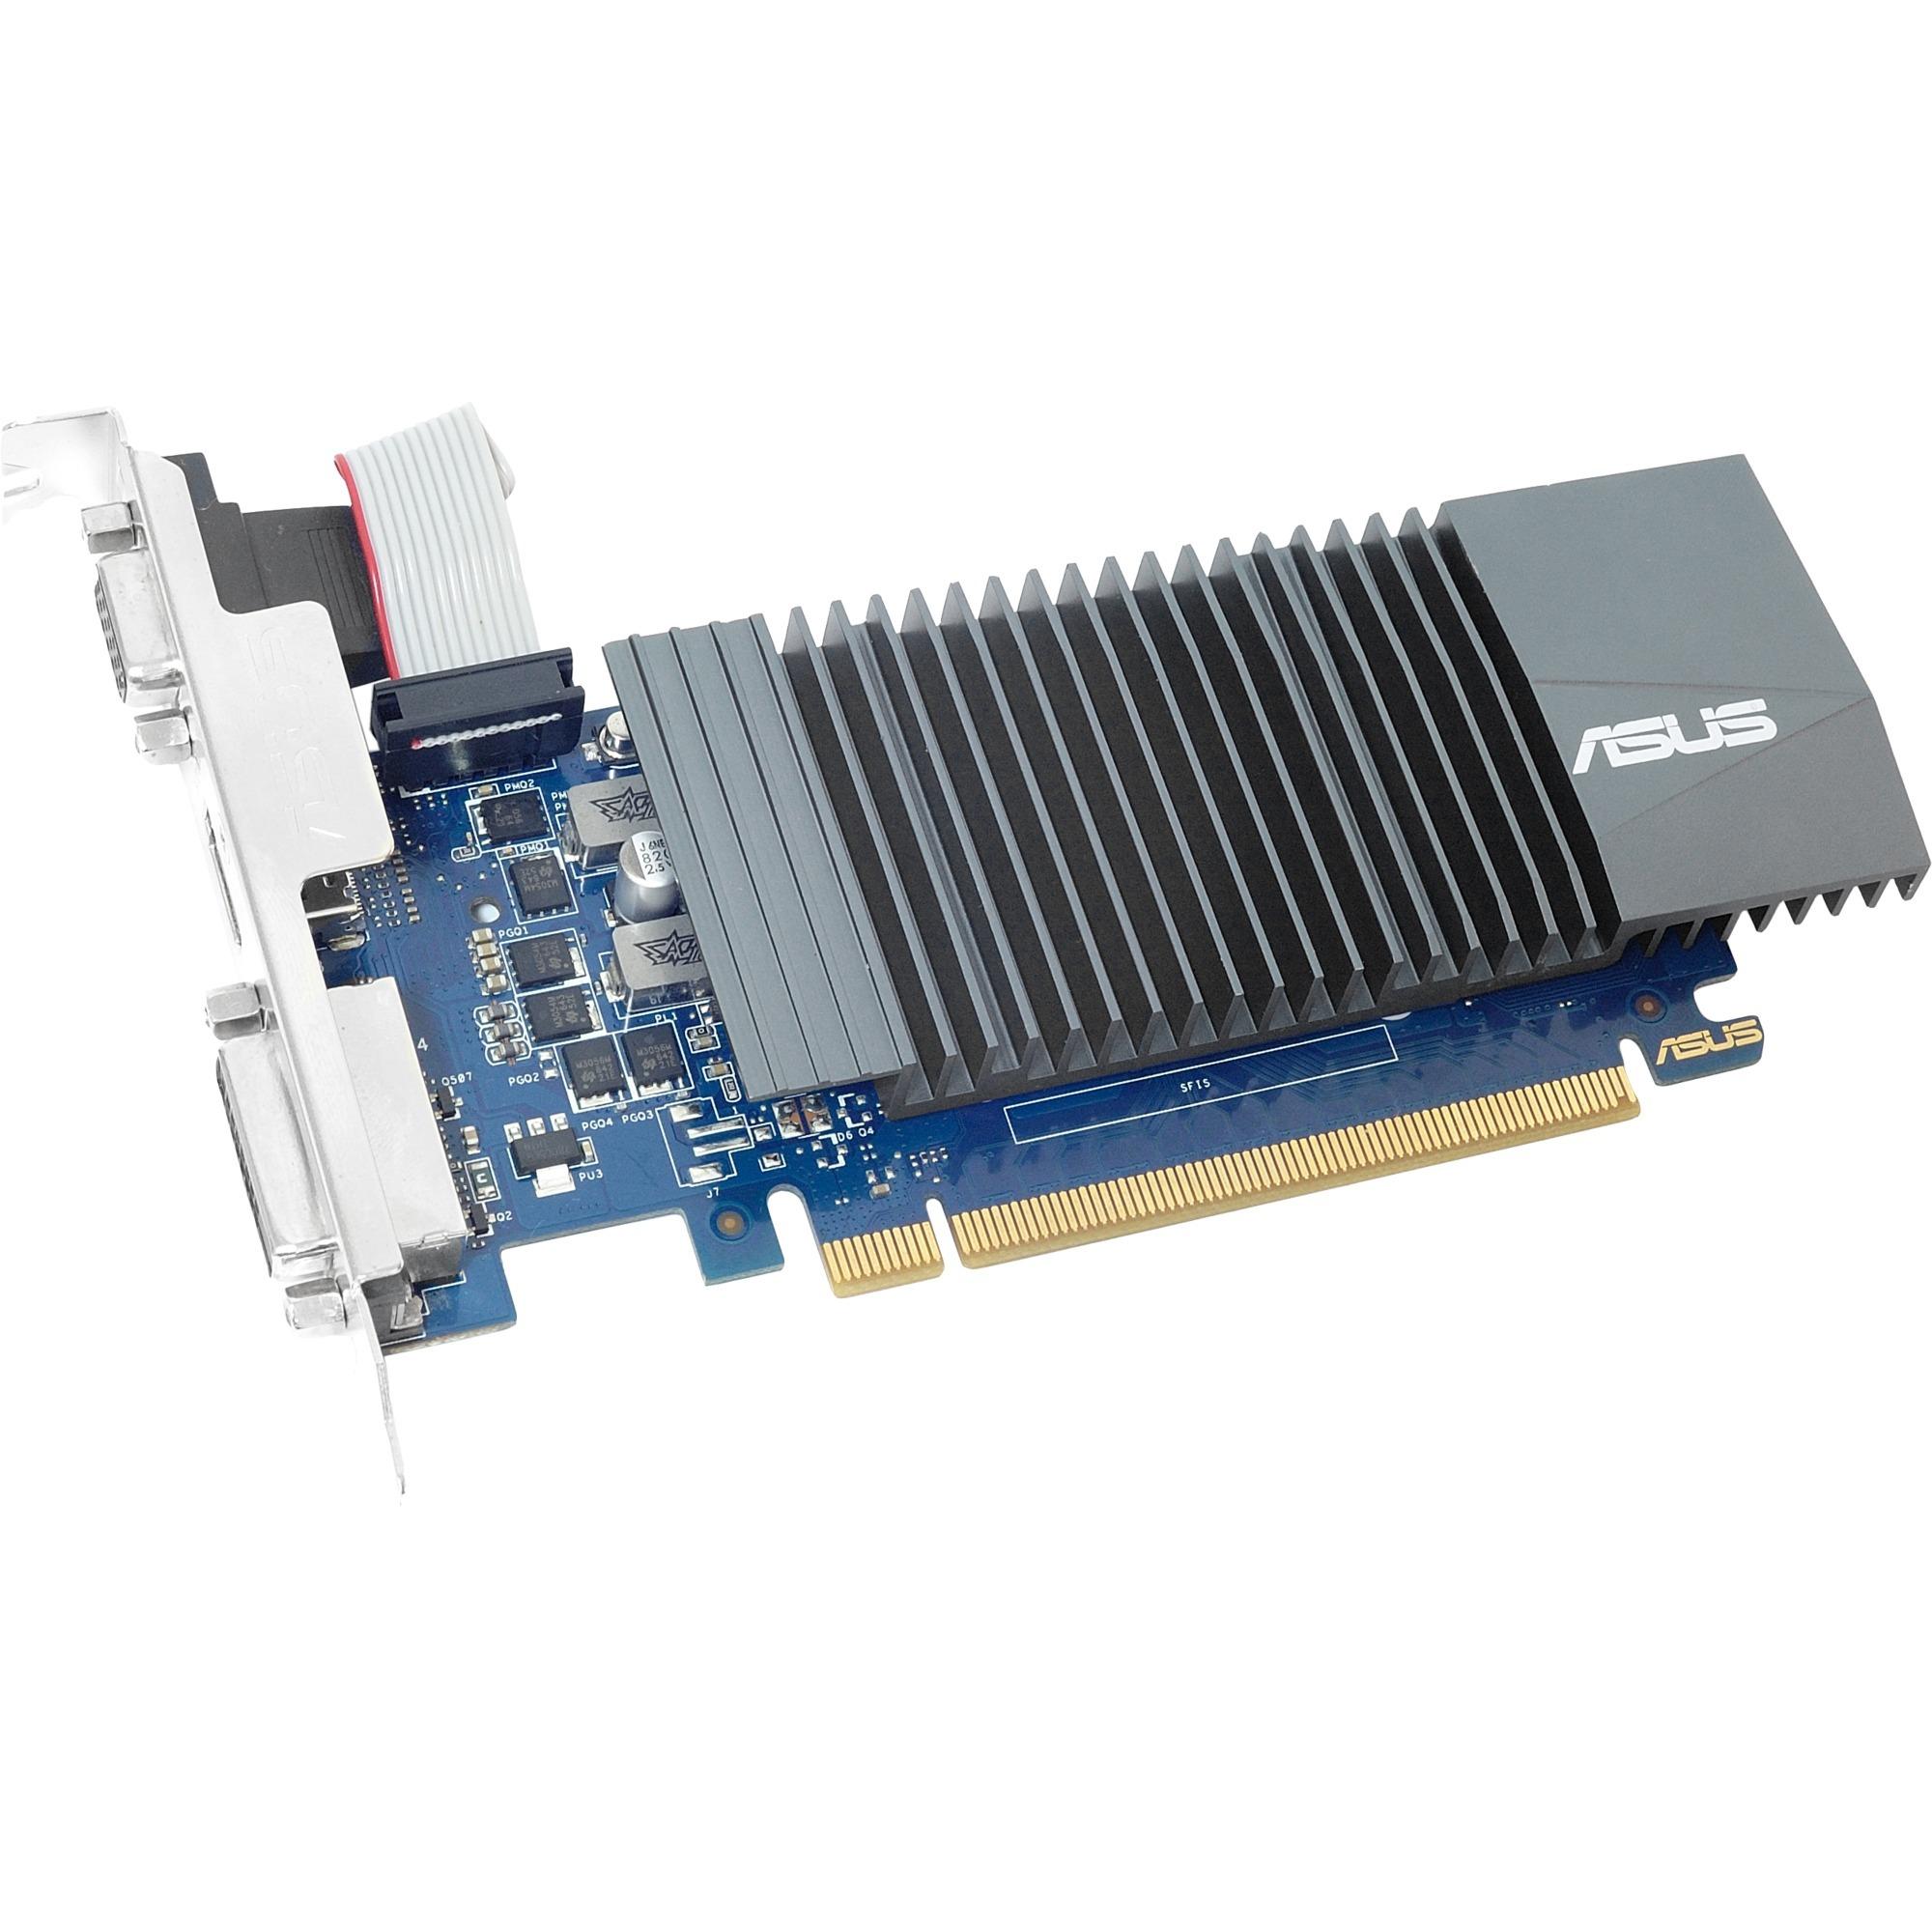 1GB D3 X 710-SL-BRK R